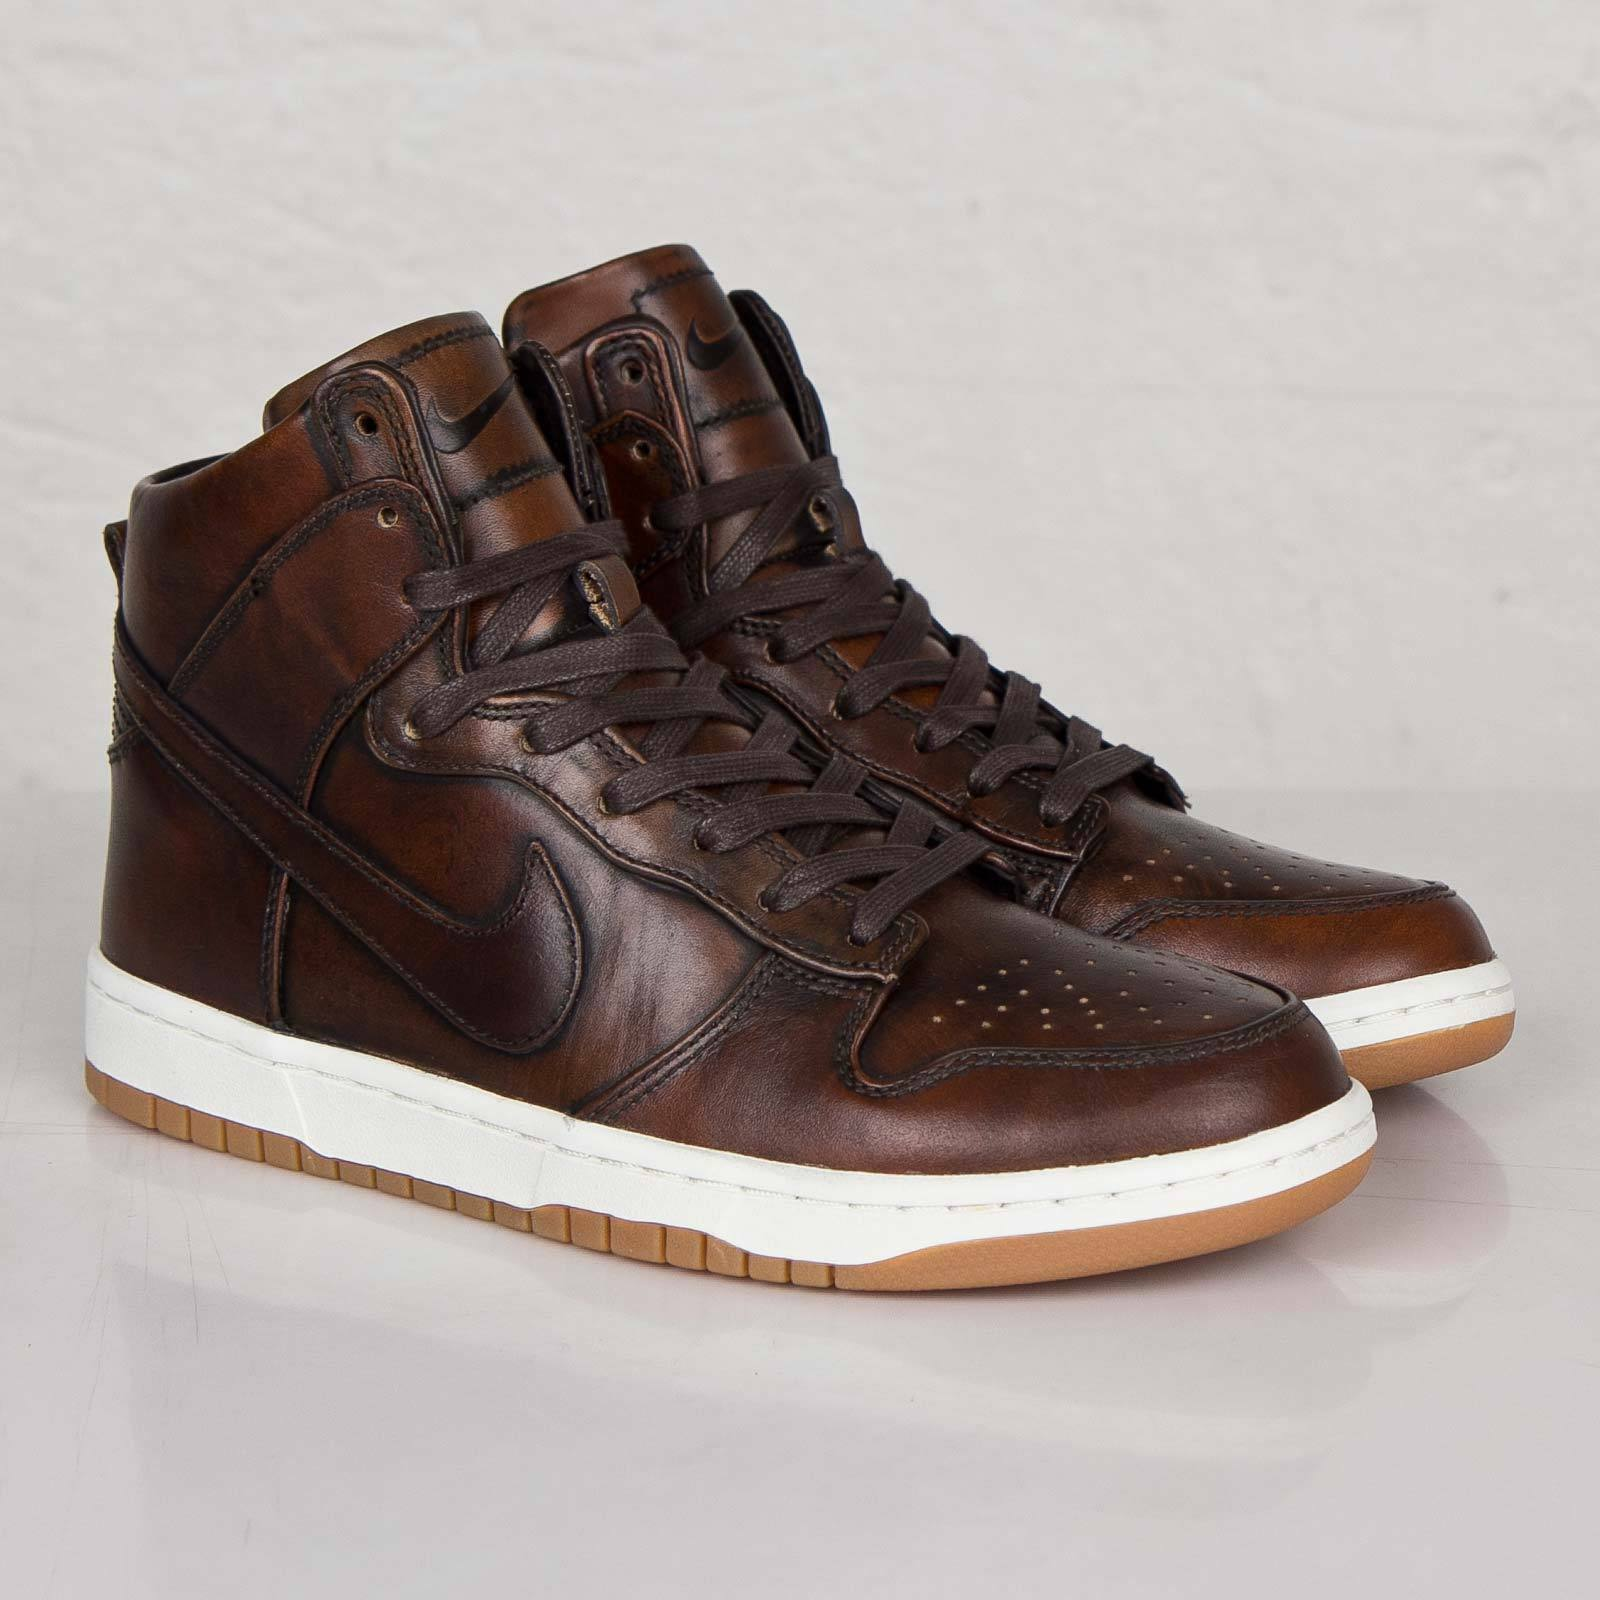 Nike MEN'S Dunk Lux BURNISHD SP SIZE 10 BRAND NEW